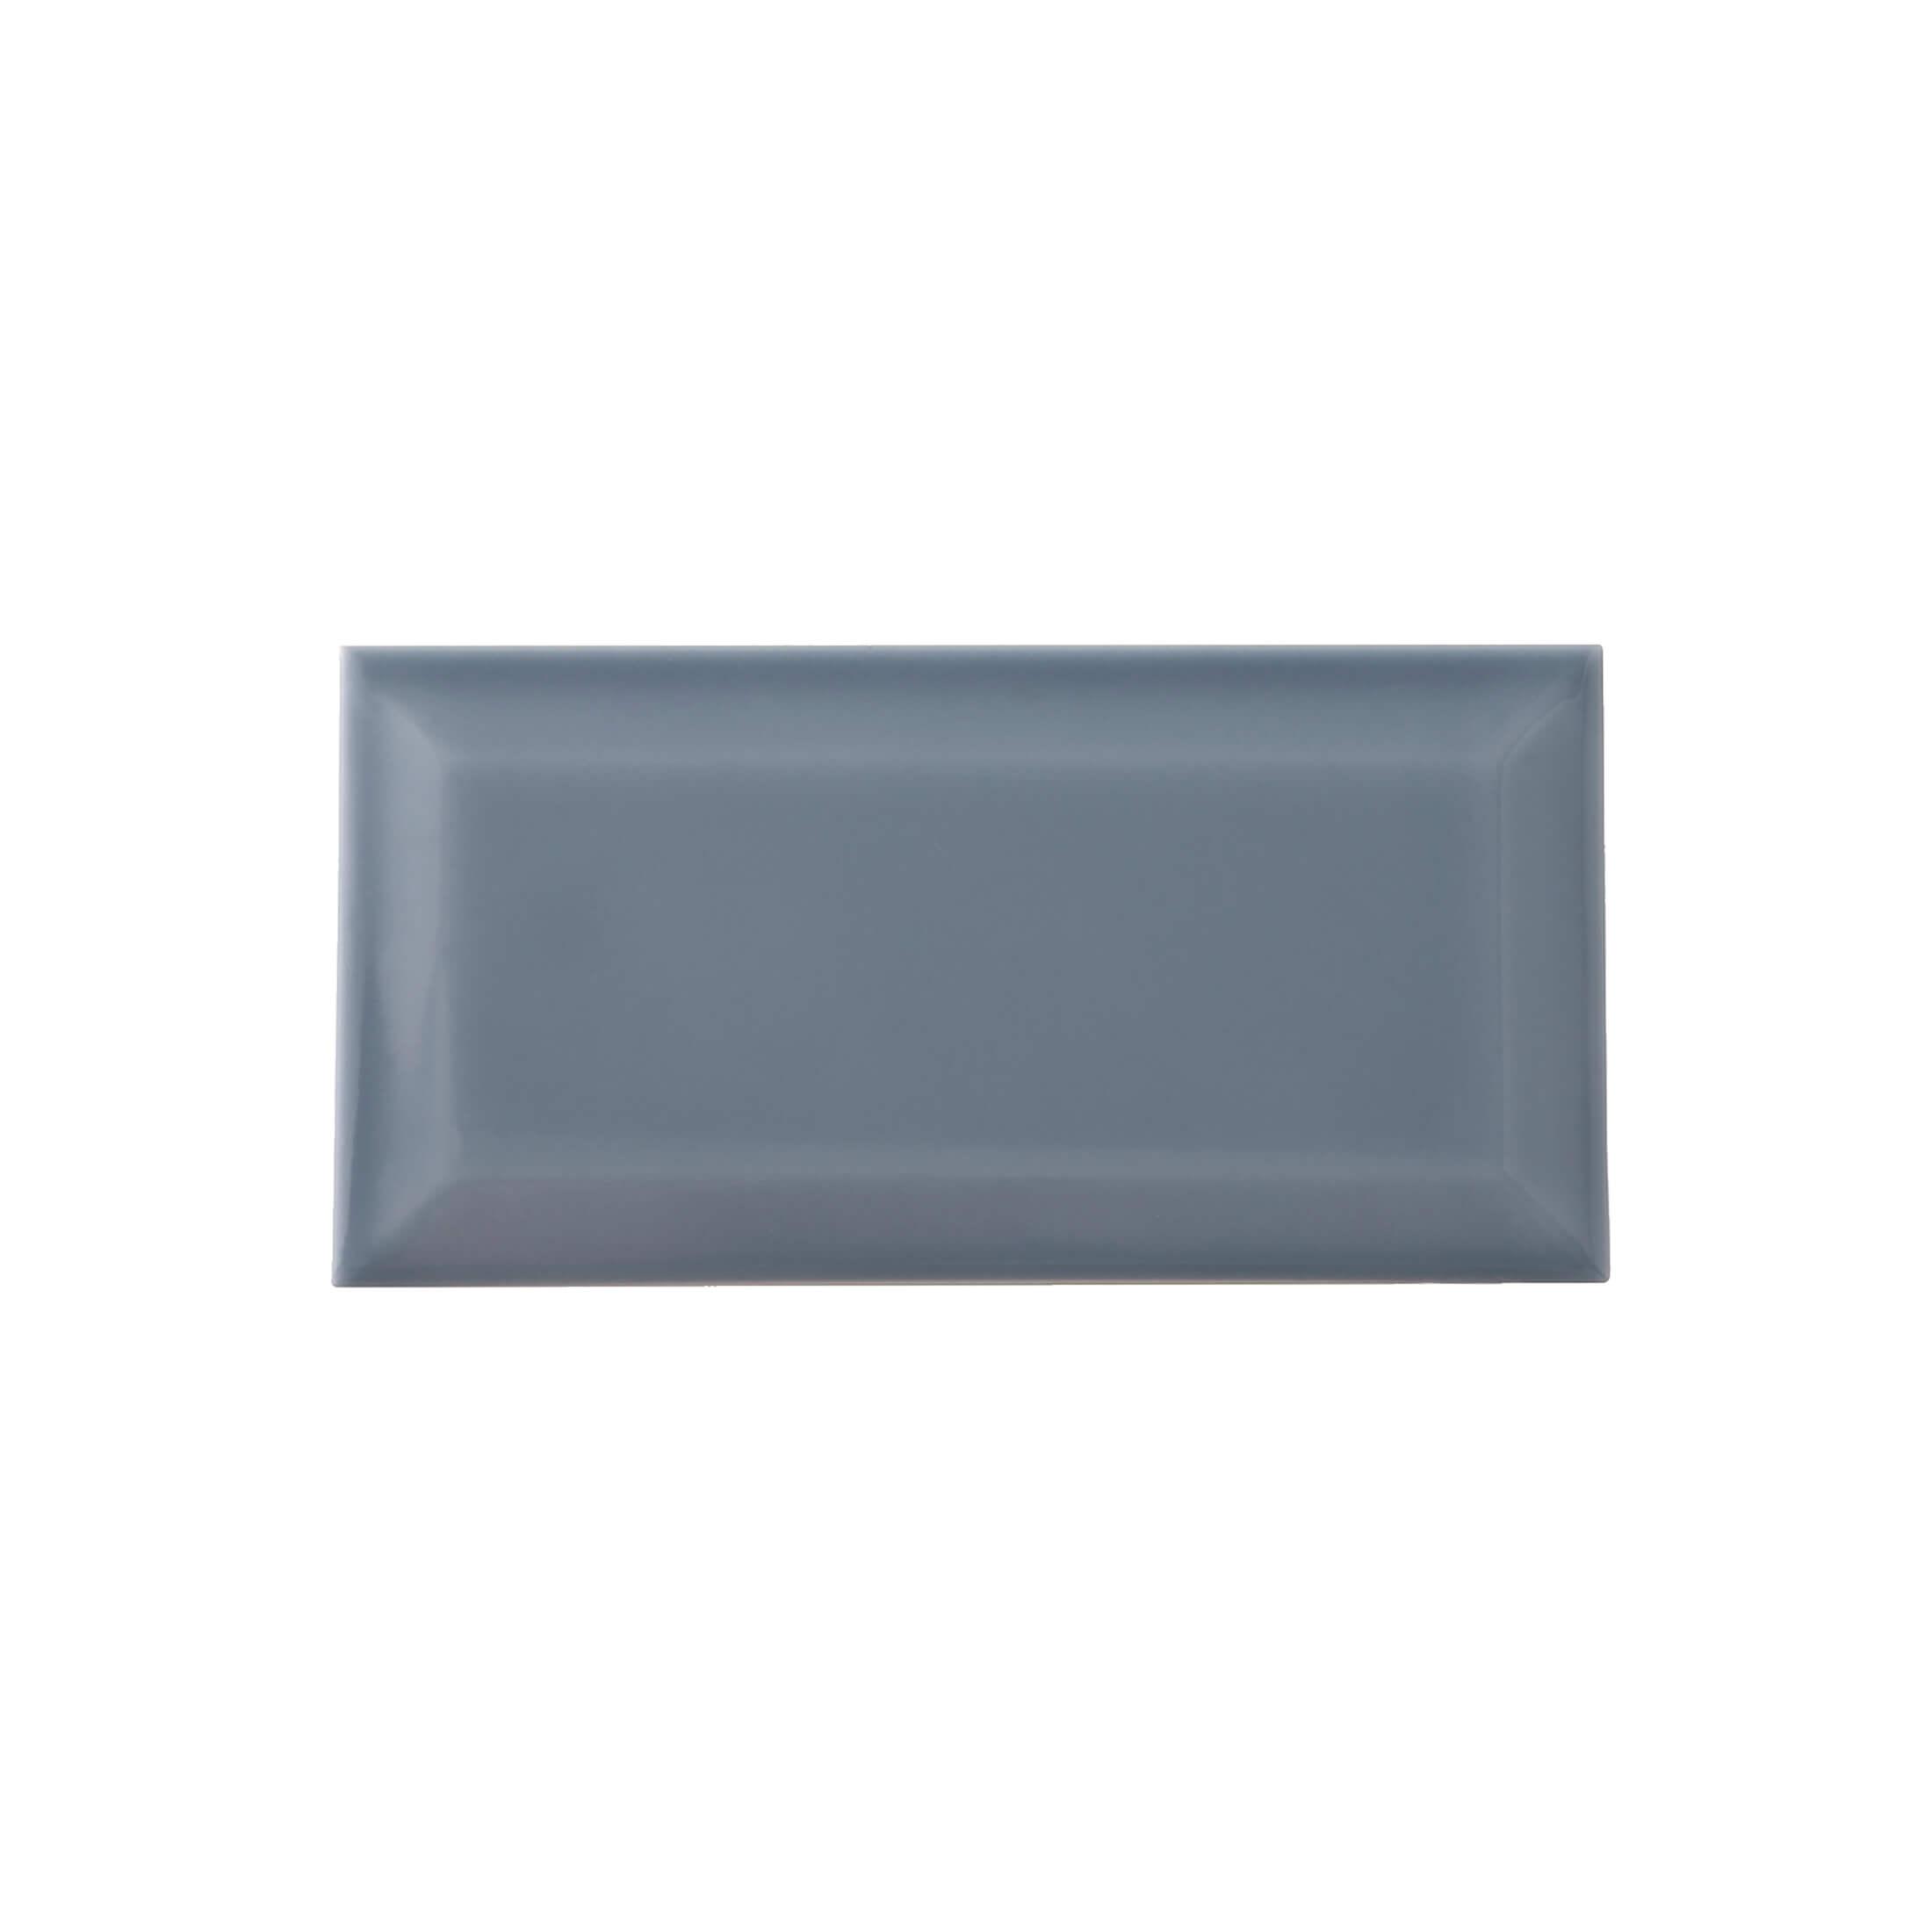 ADNE2055 - BISELADO PB - 10 cm X 20 cm